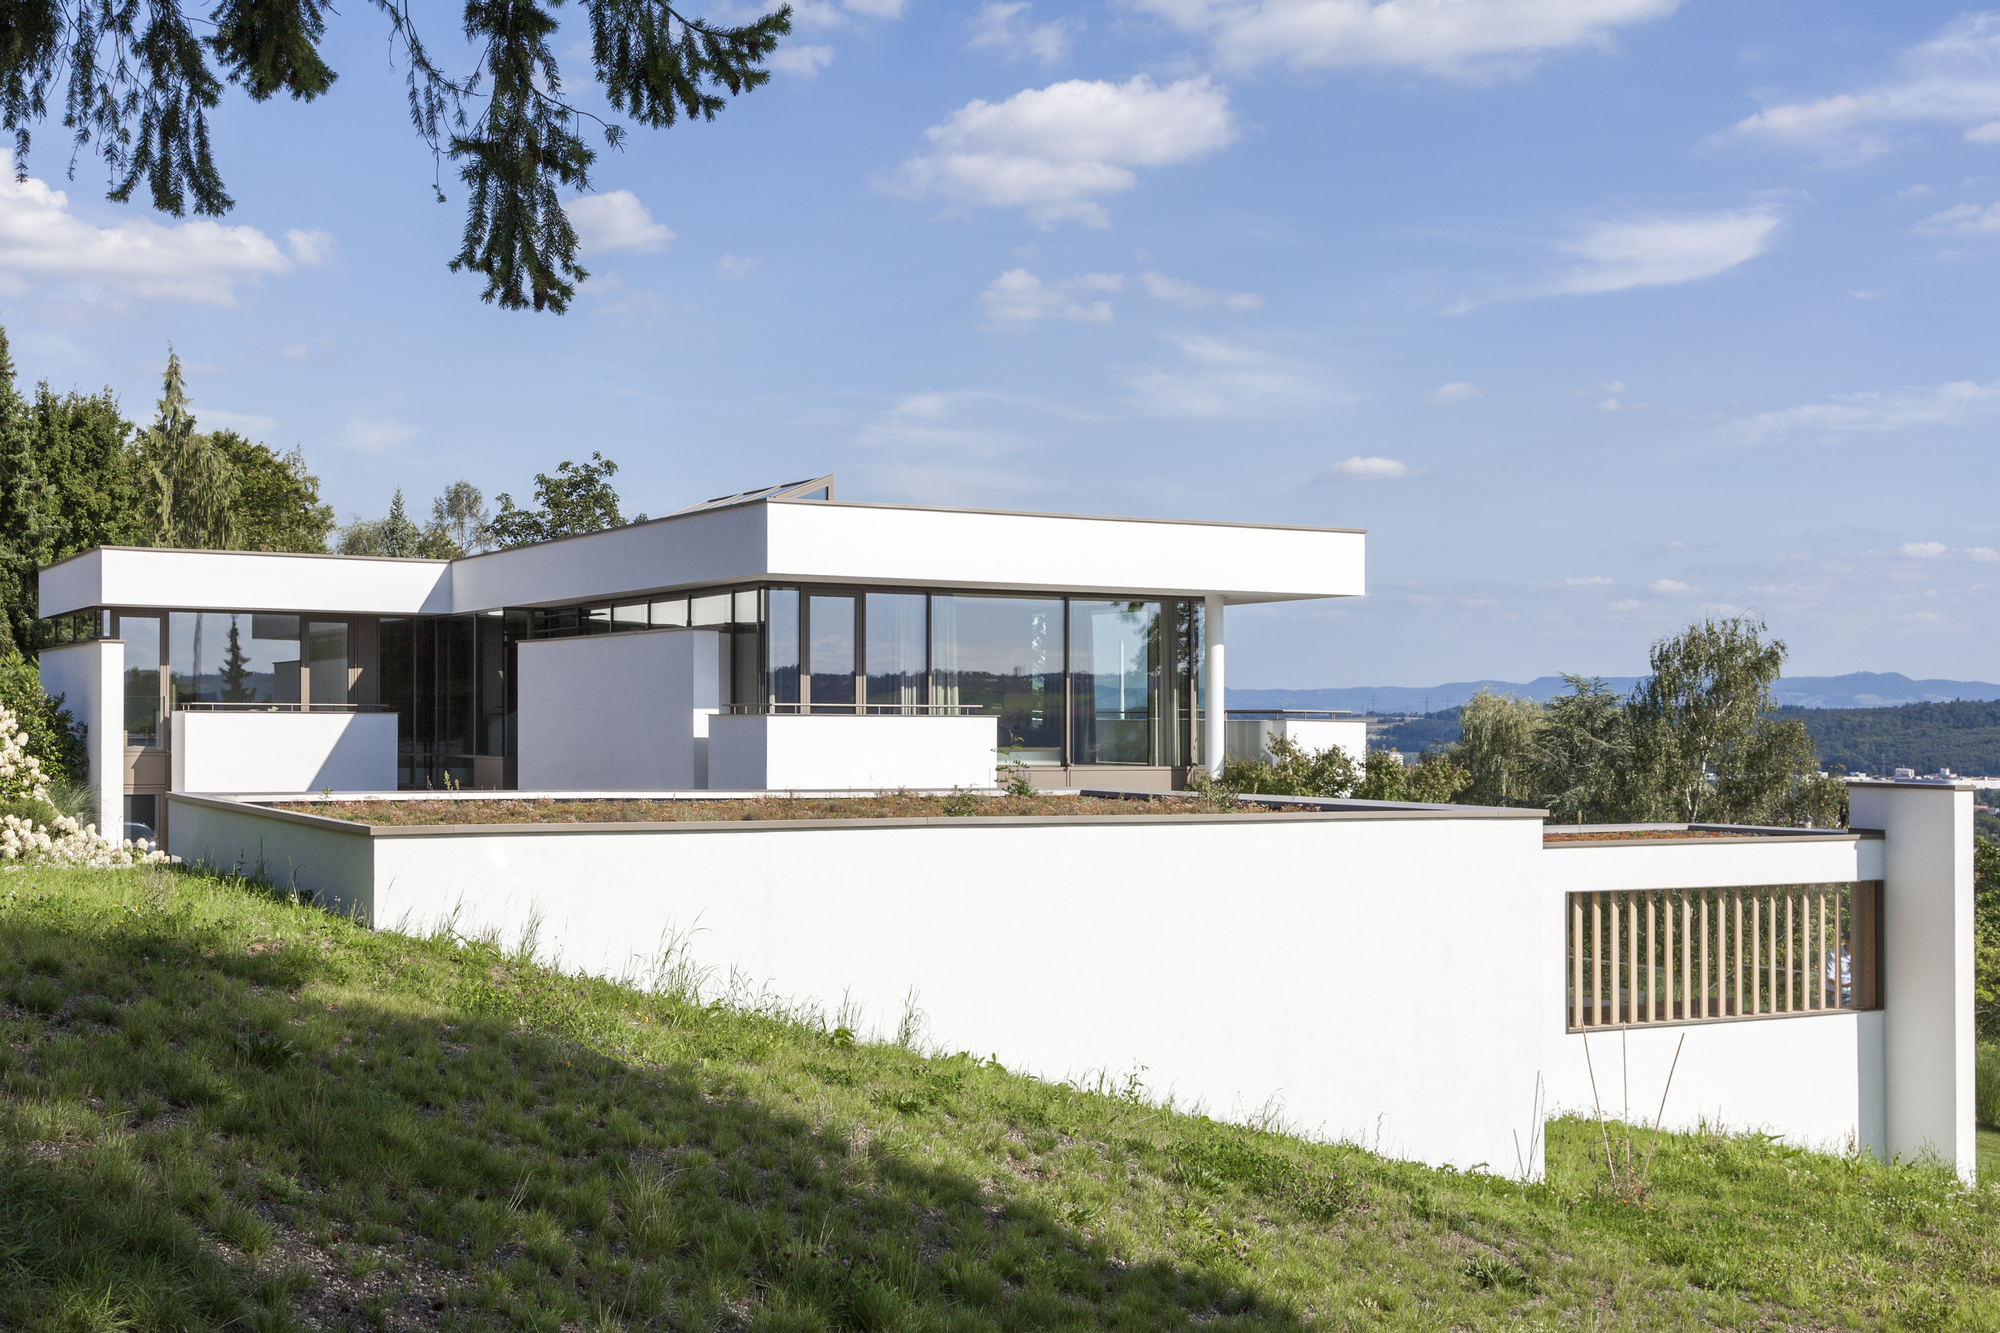 Gallery of house fmb fuchs wacker architekten 24 - Fmb architekten ...